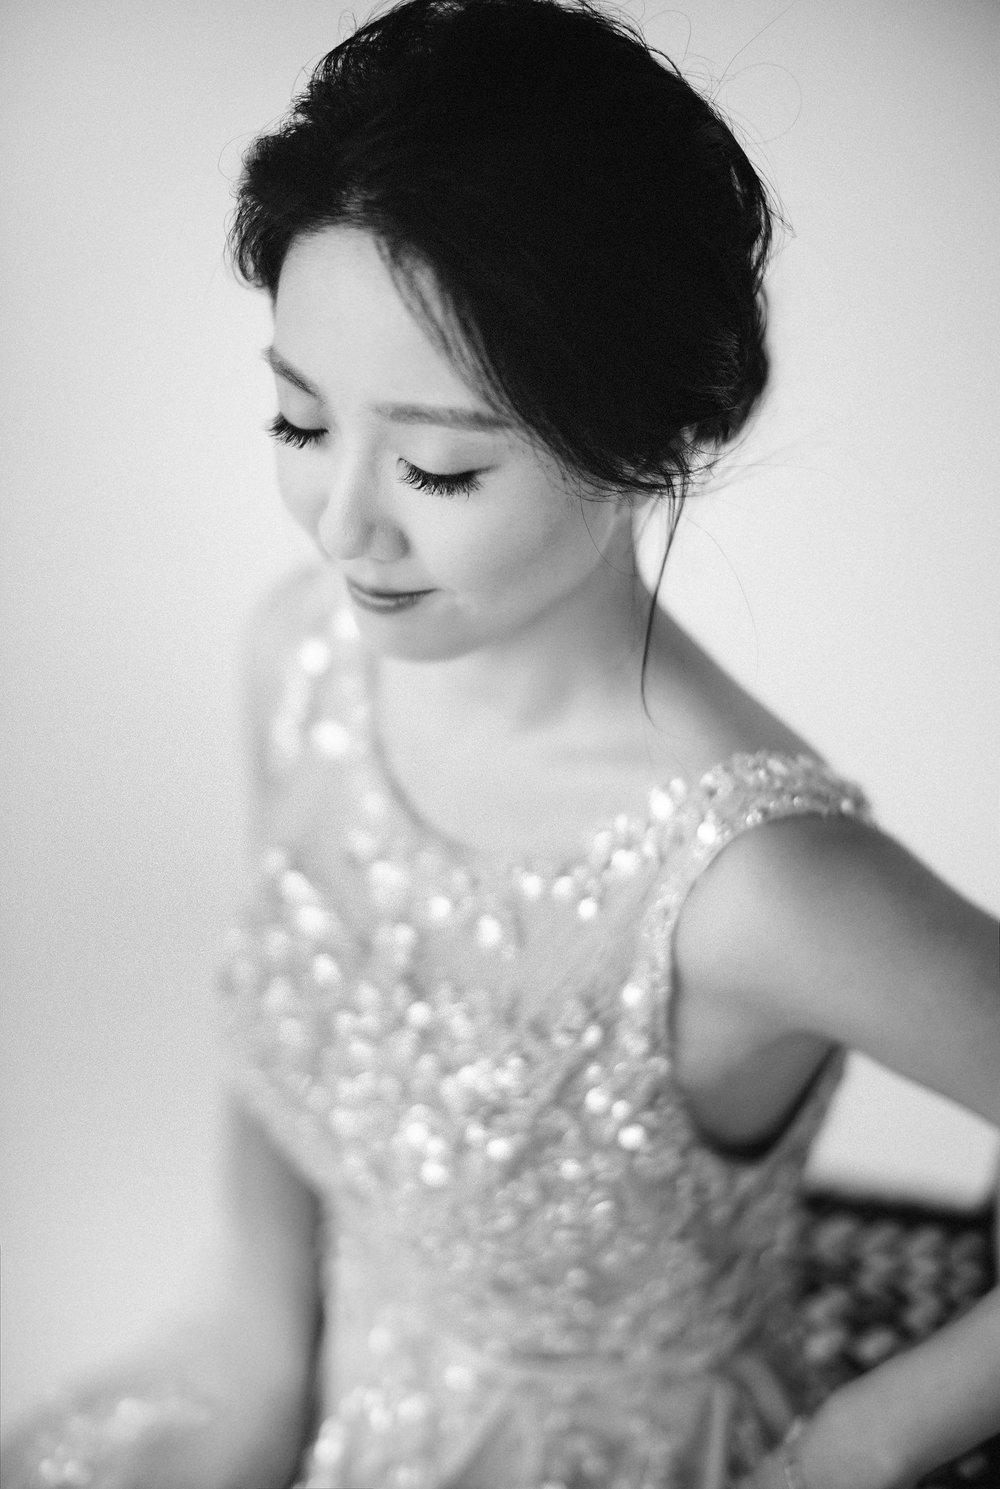 Chris_Hui_婚禮_婚紗照_pre_wedding_photography_best_046_.jpg